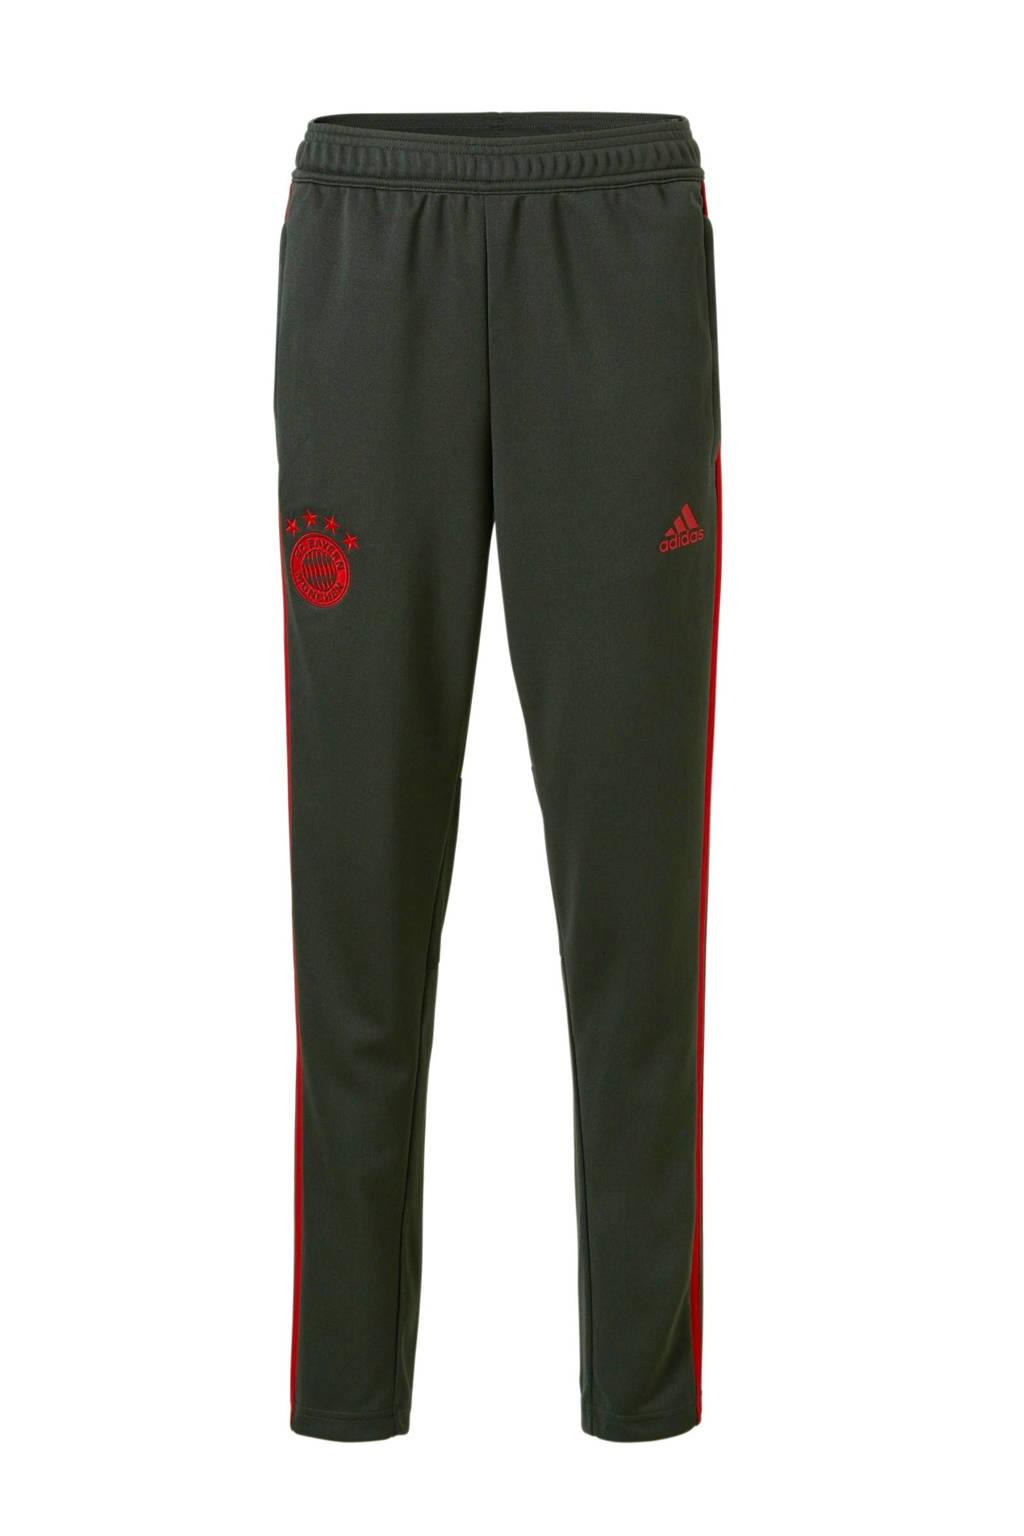 adidas performance Junior FC Bayern München sportbroek, Donkergroen/rood